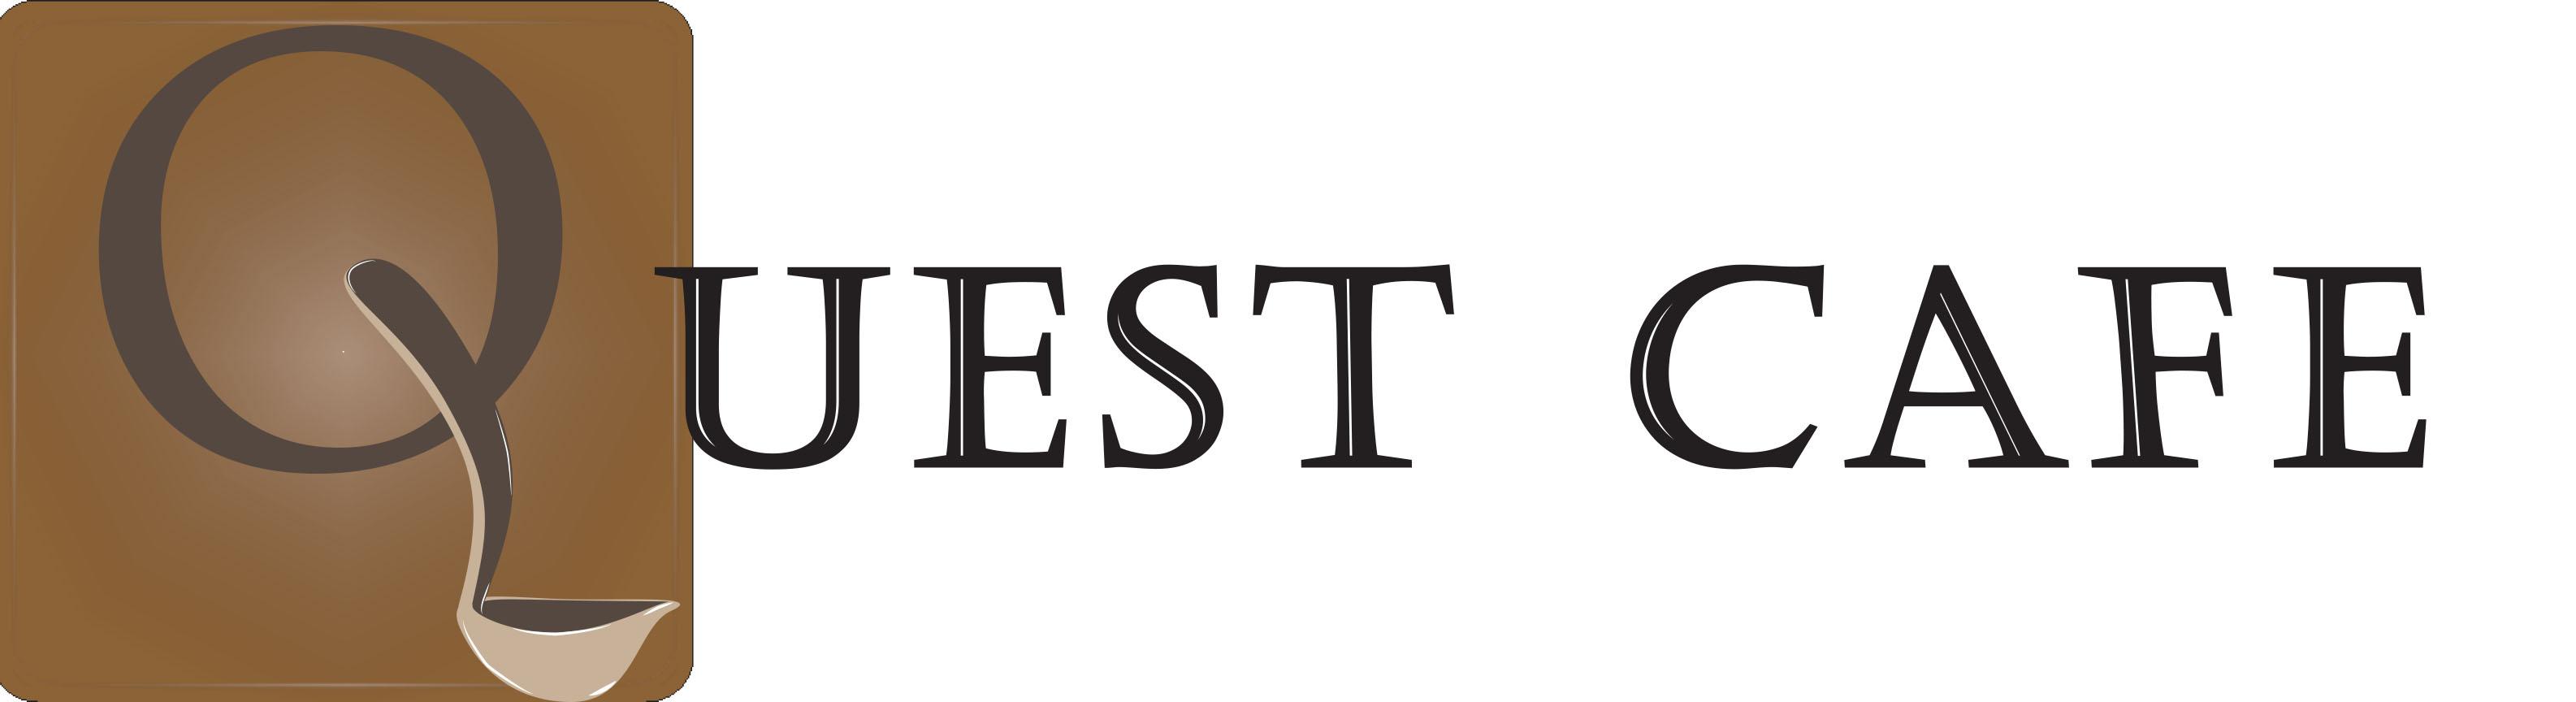 logo1 final